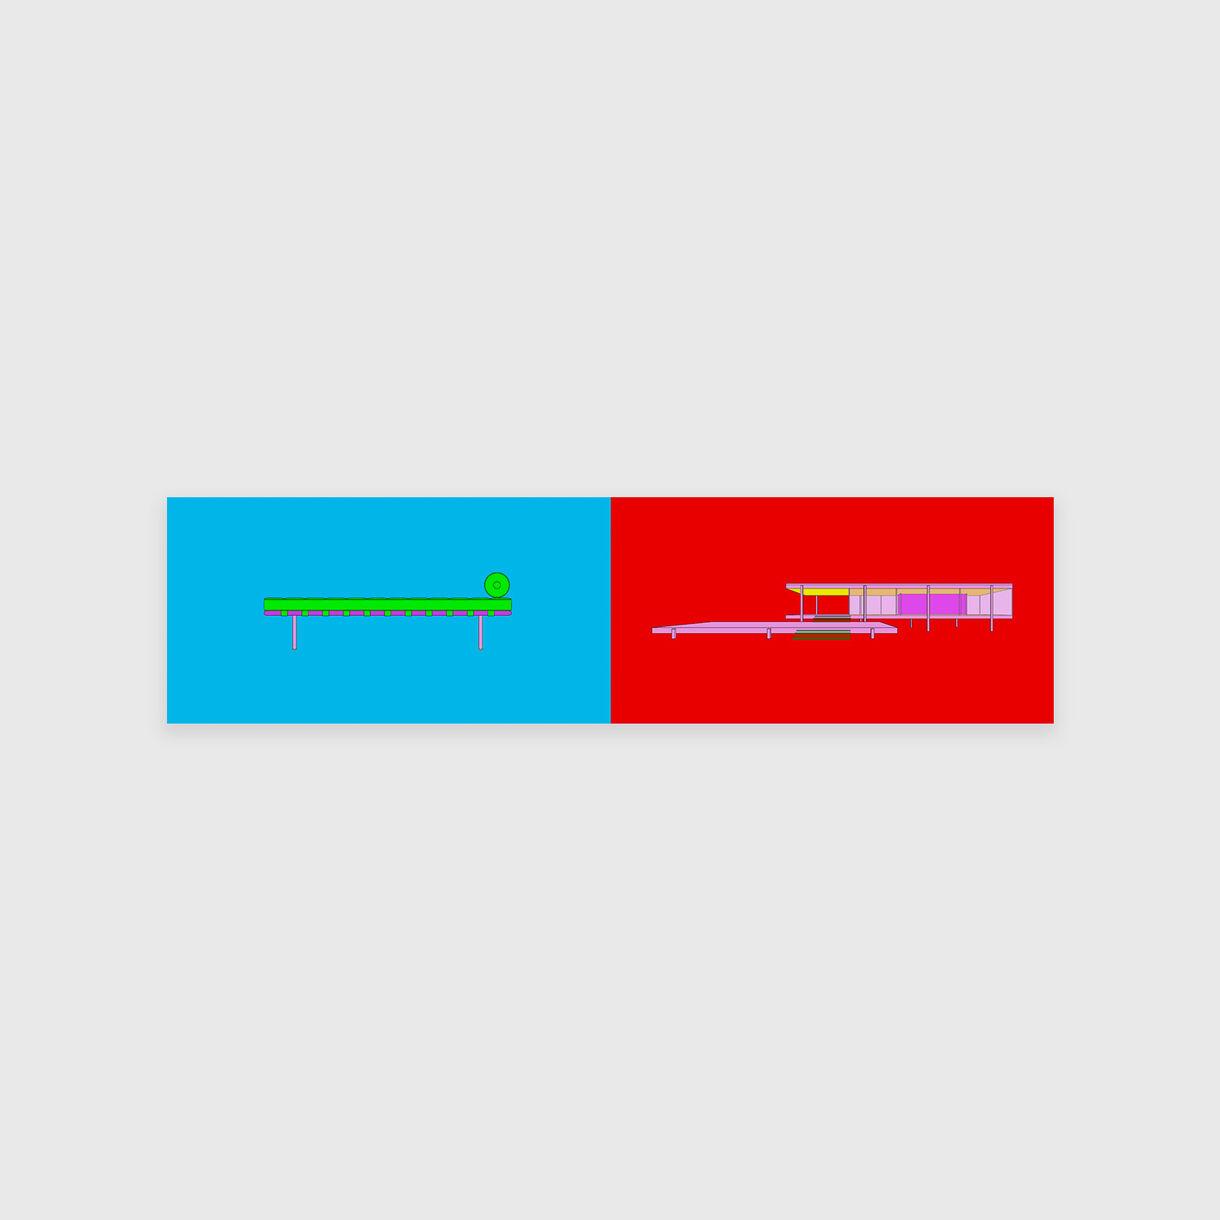 Design and Architecture – Mies van der Rohe, Michael Craig-Martin